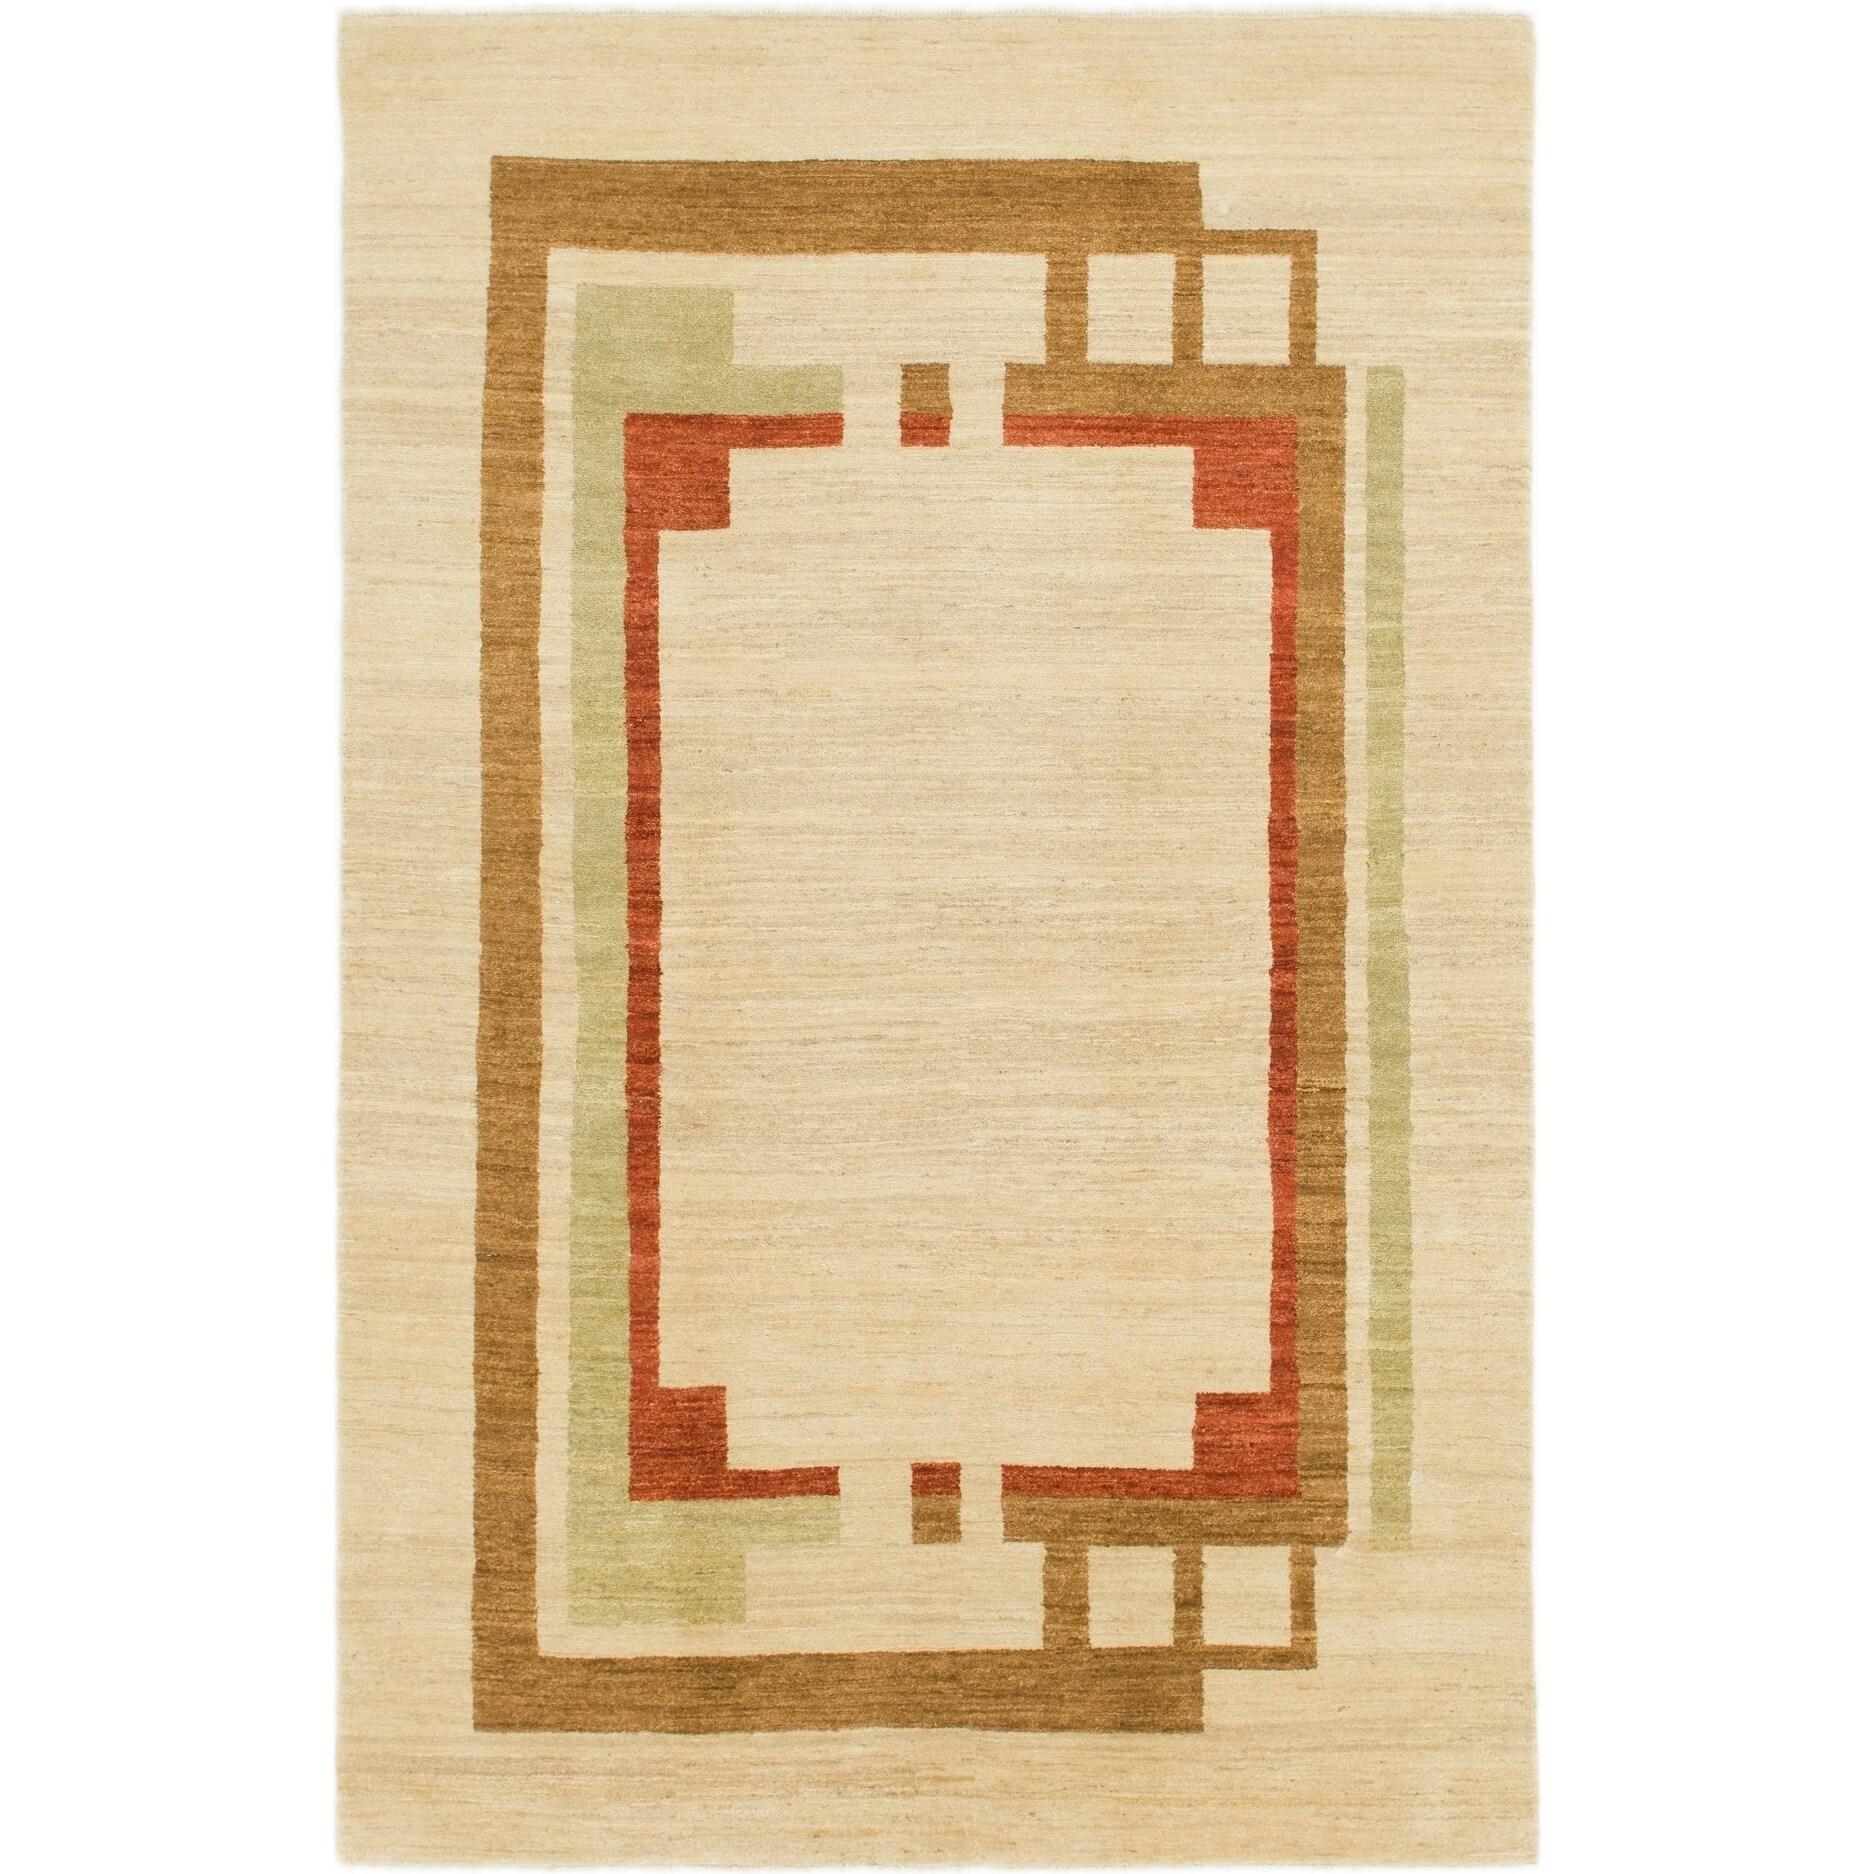 Hand Knotted Kashkuli Gabbeh Wool Area Rug - 5 8 x 8 8 (Cream - 5 8 x 8 8)